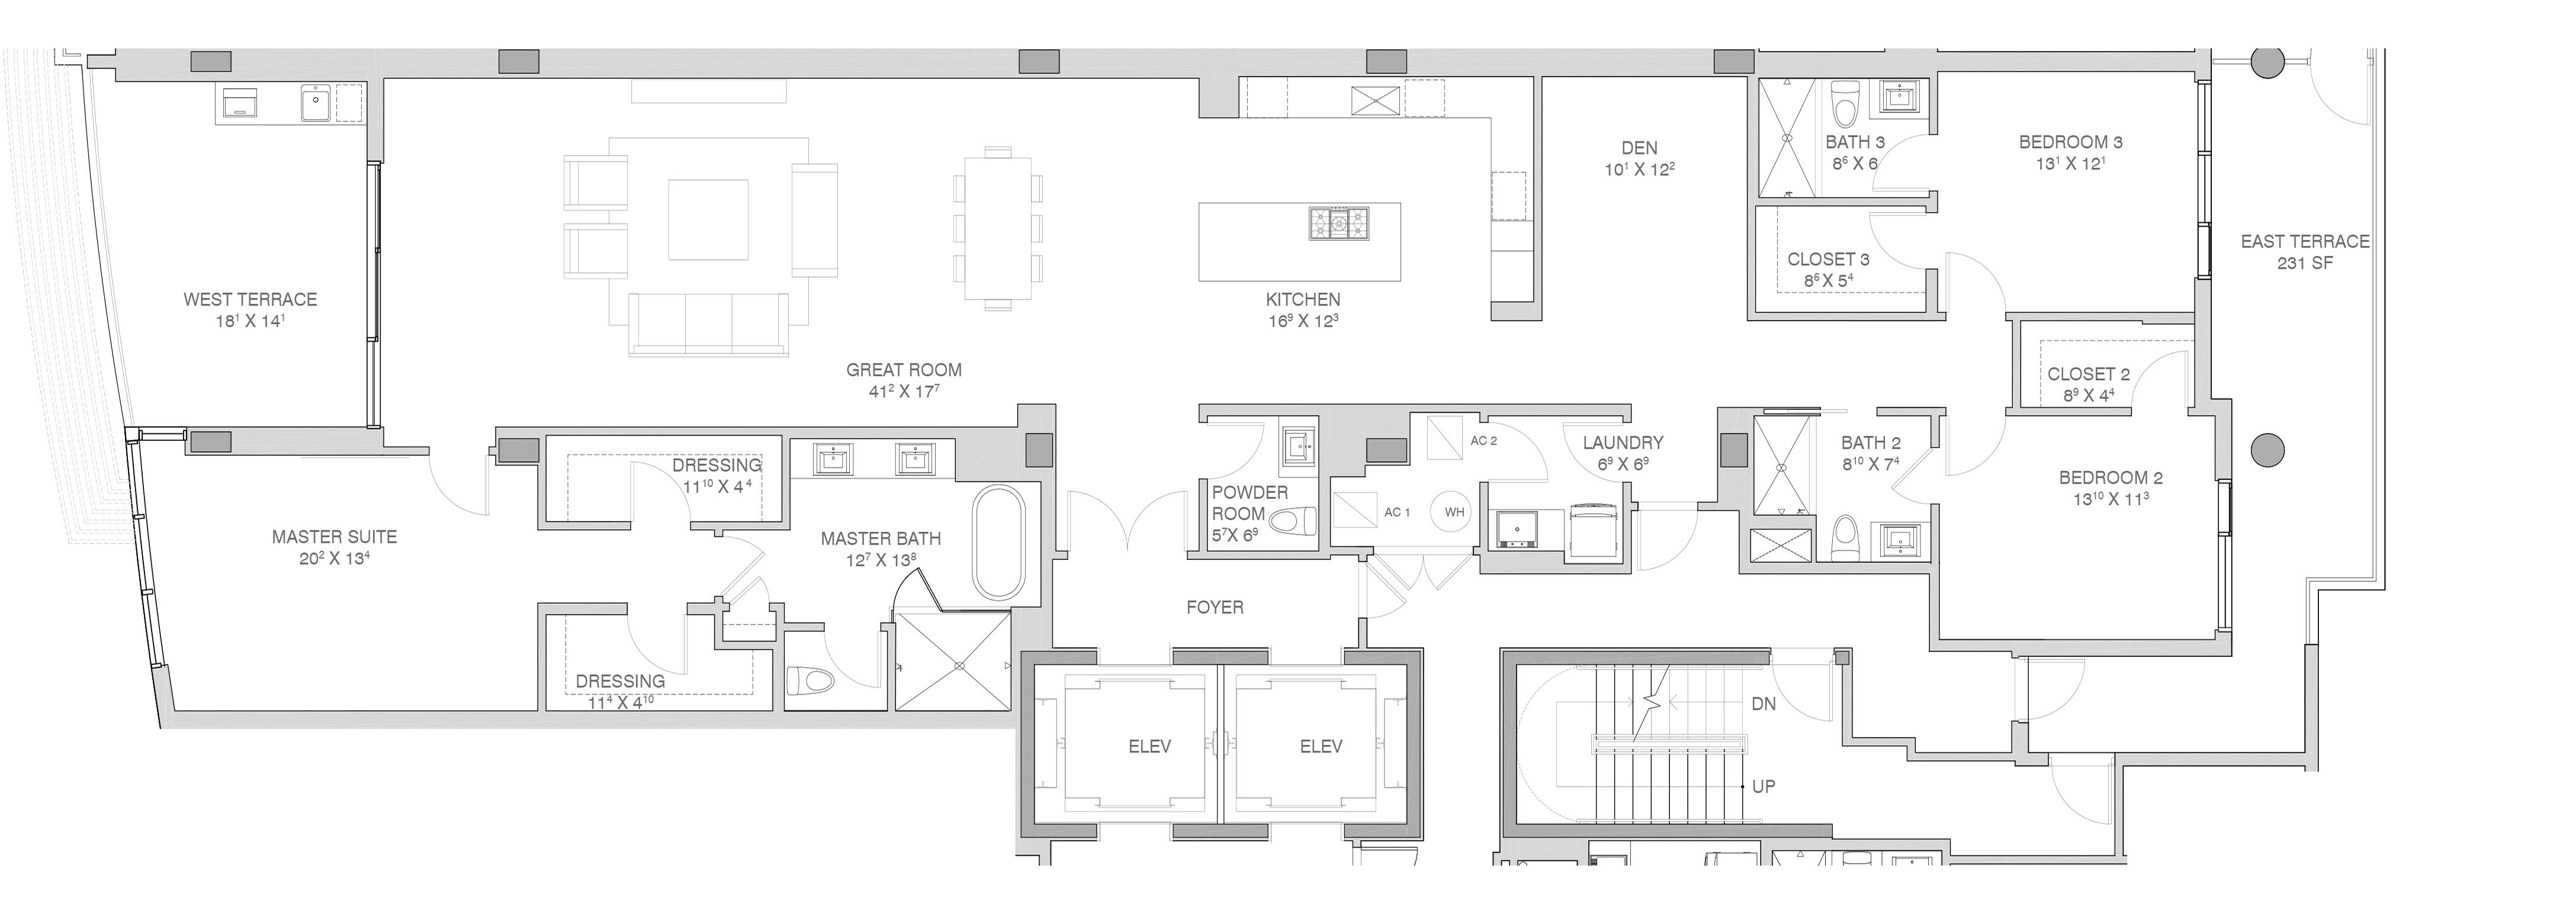 Adagio Fort Lauderdale Beach - Floorplan 2